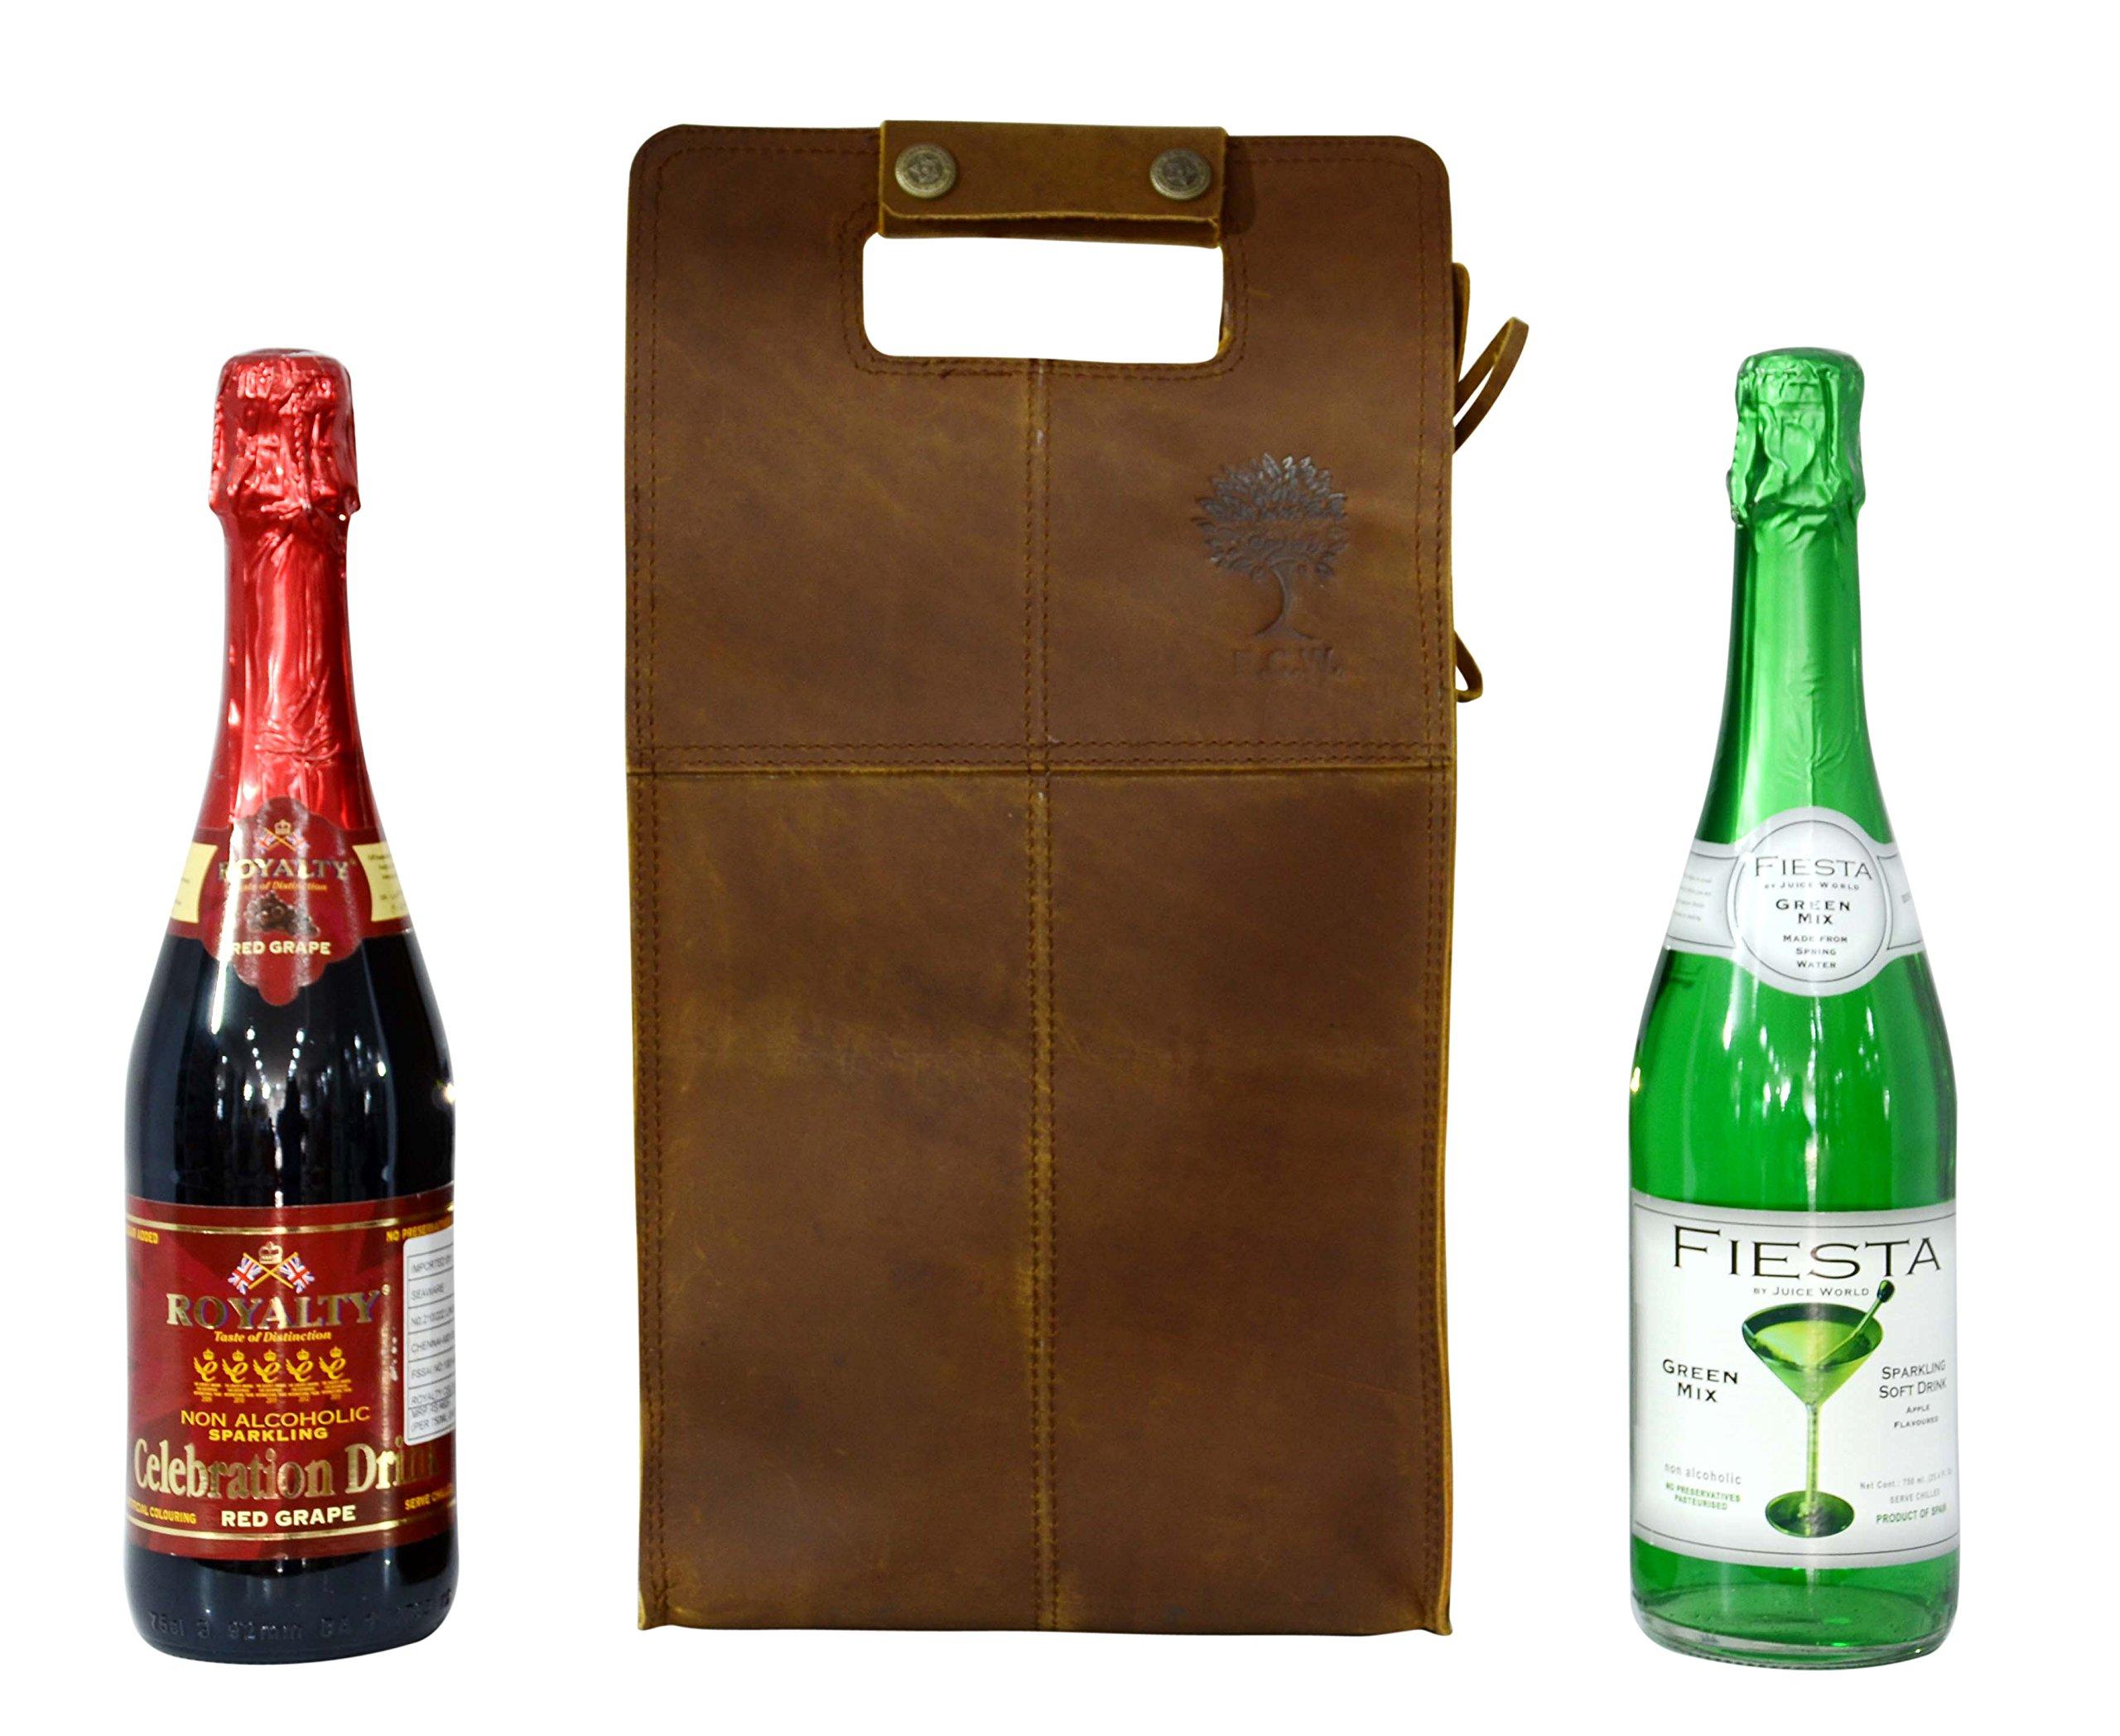 Double Wine Bottle Carrier Bag Leather Bottle Holder Tote Reusable Gift Bag Champagne Case, Valentines Gift Bag by ECOCRAFTWORLD (Image #2)